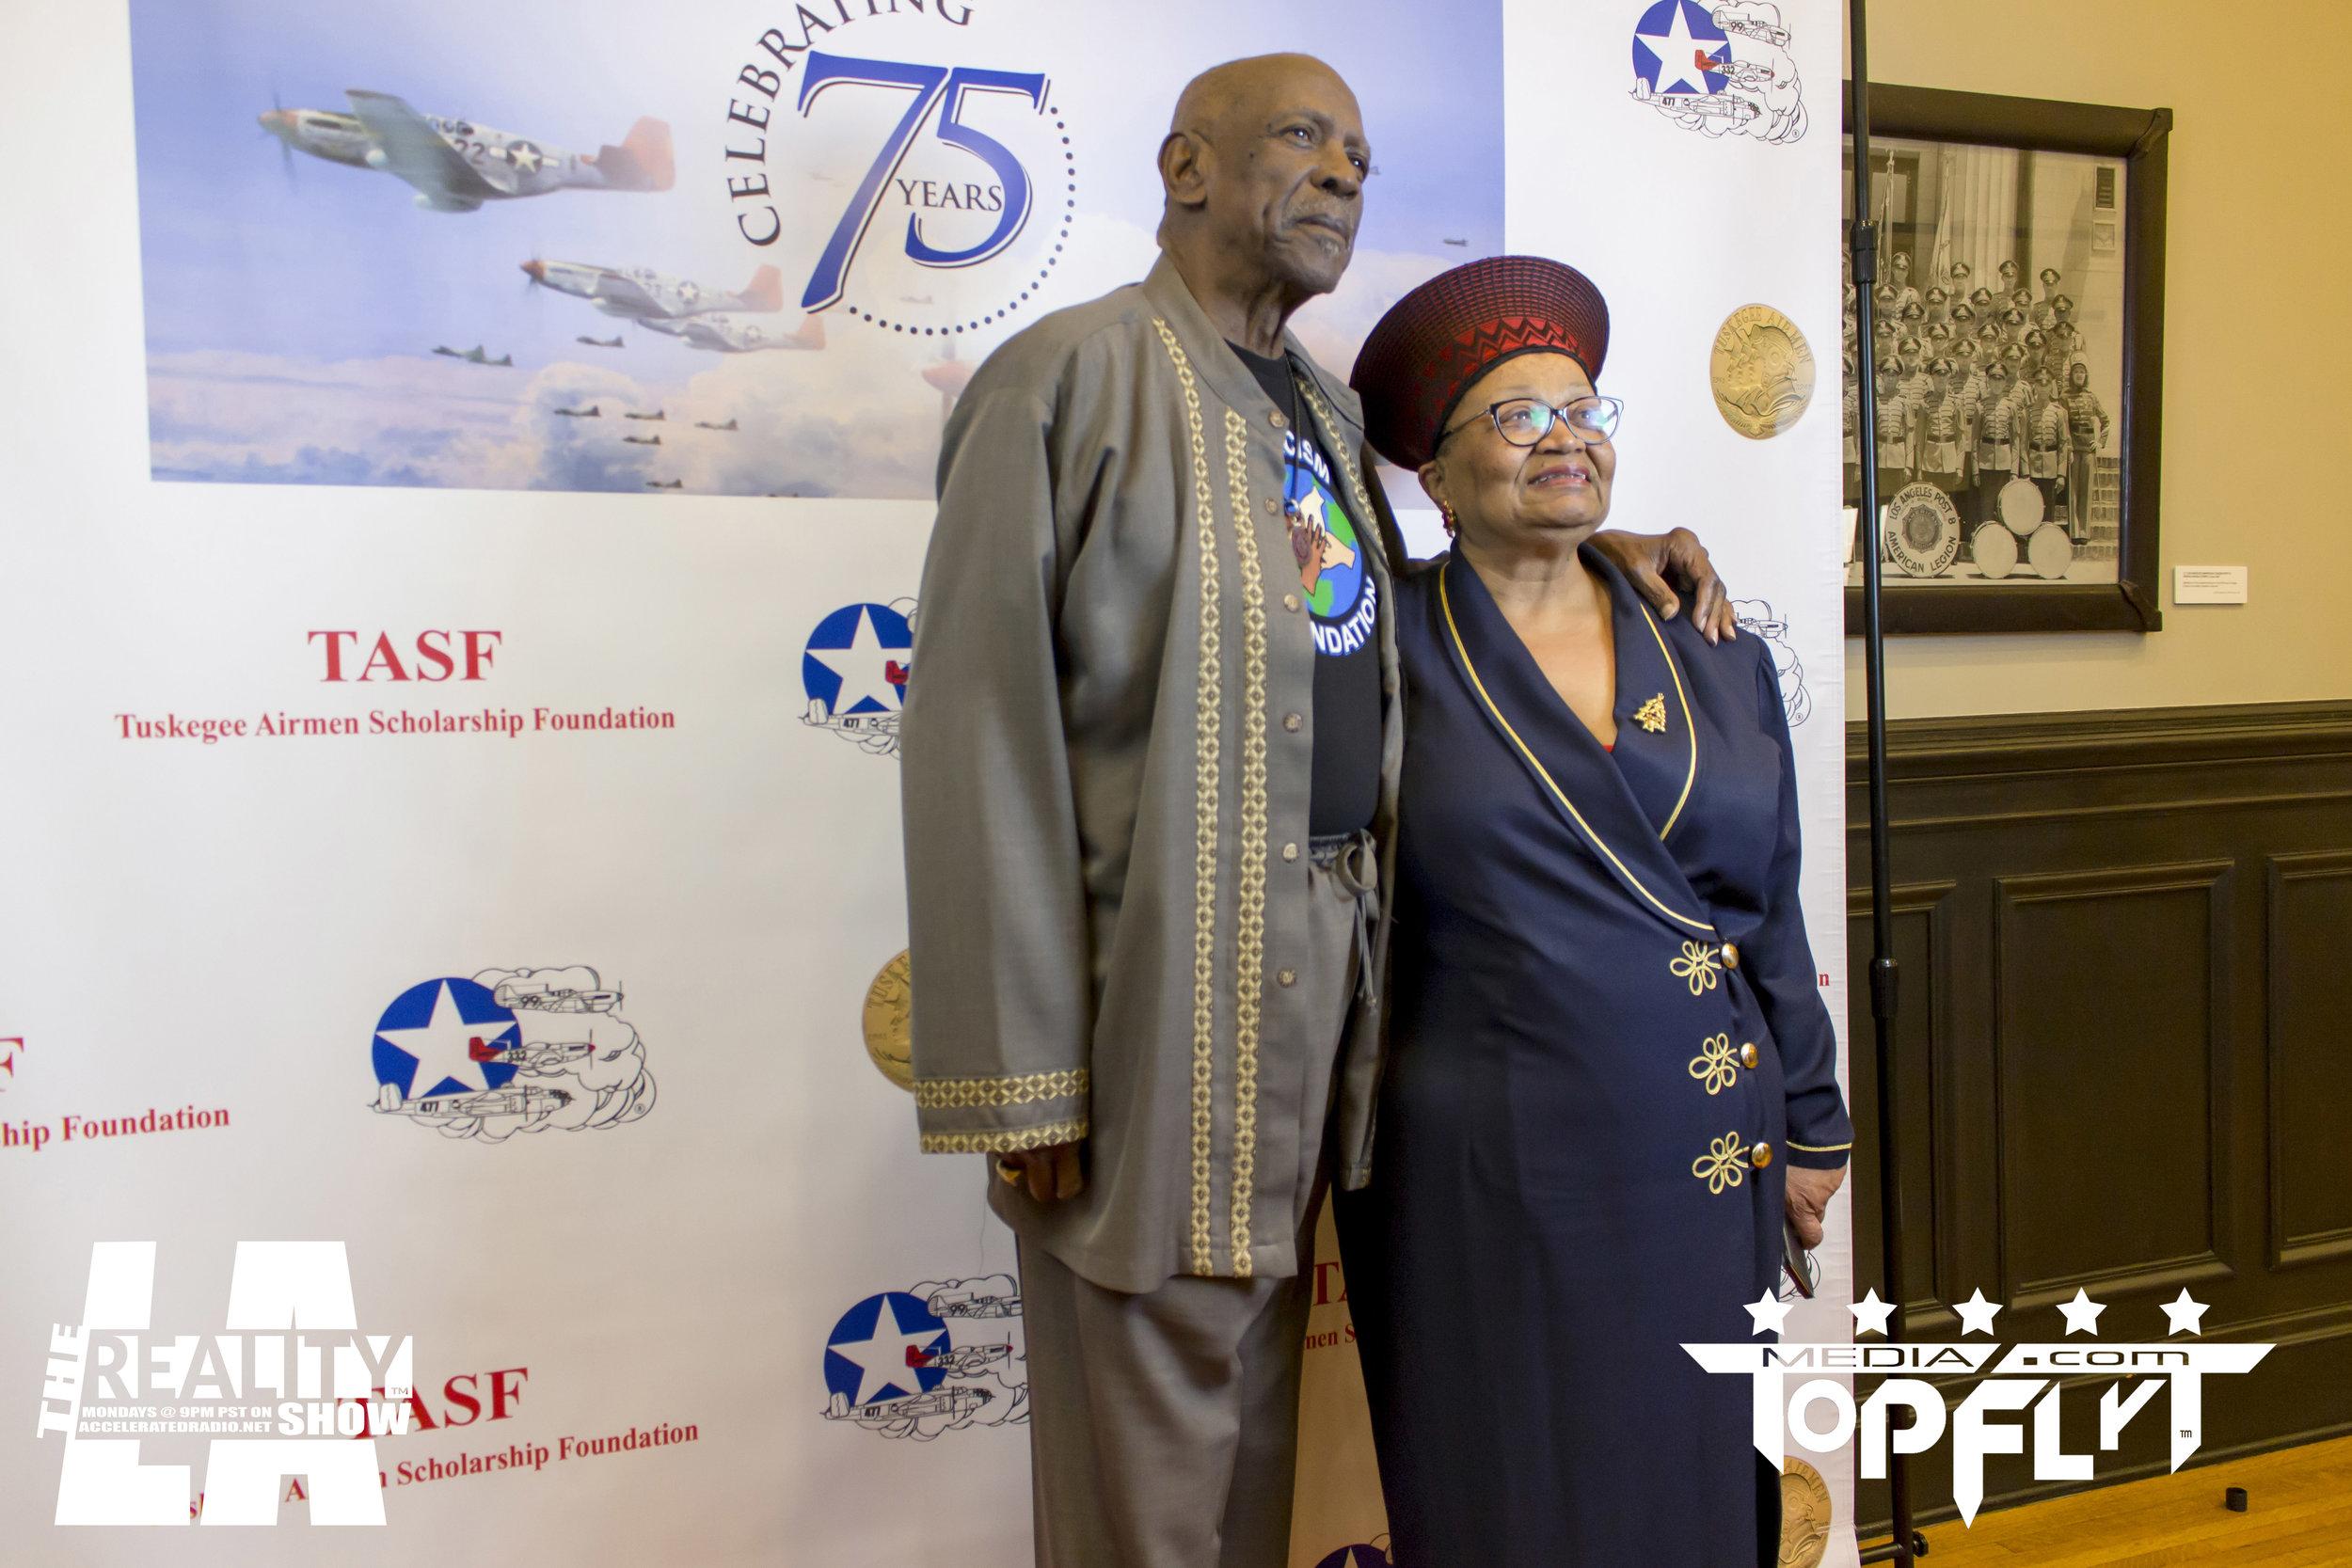 The Reality Show LA - Tuskegee Airmen 75th Anniversary VIP Reception_153.jpg